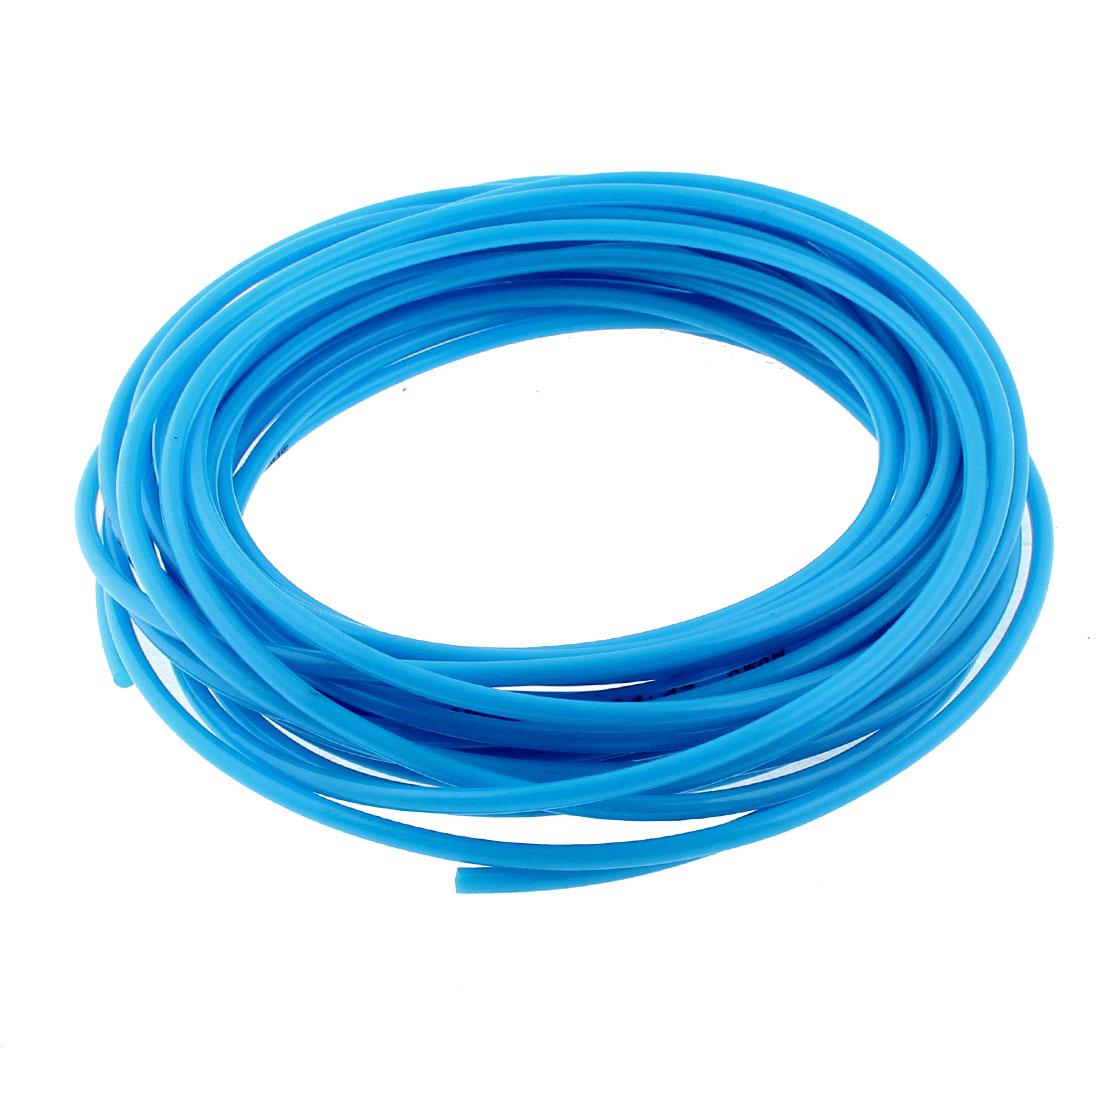 9.8M 32Ft 4mmx2.5mm Blue Air Compressor Line Polyurethane PU Hose Tube Tubing